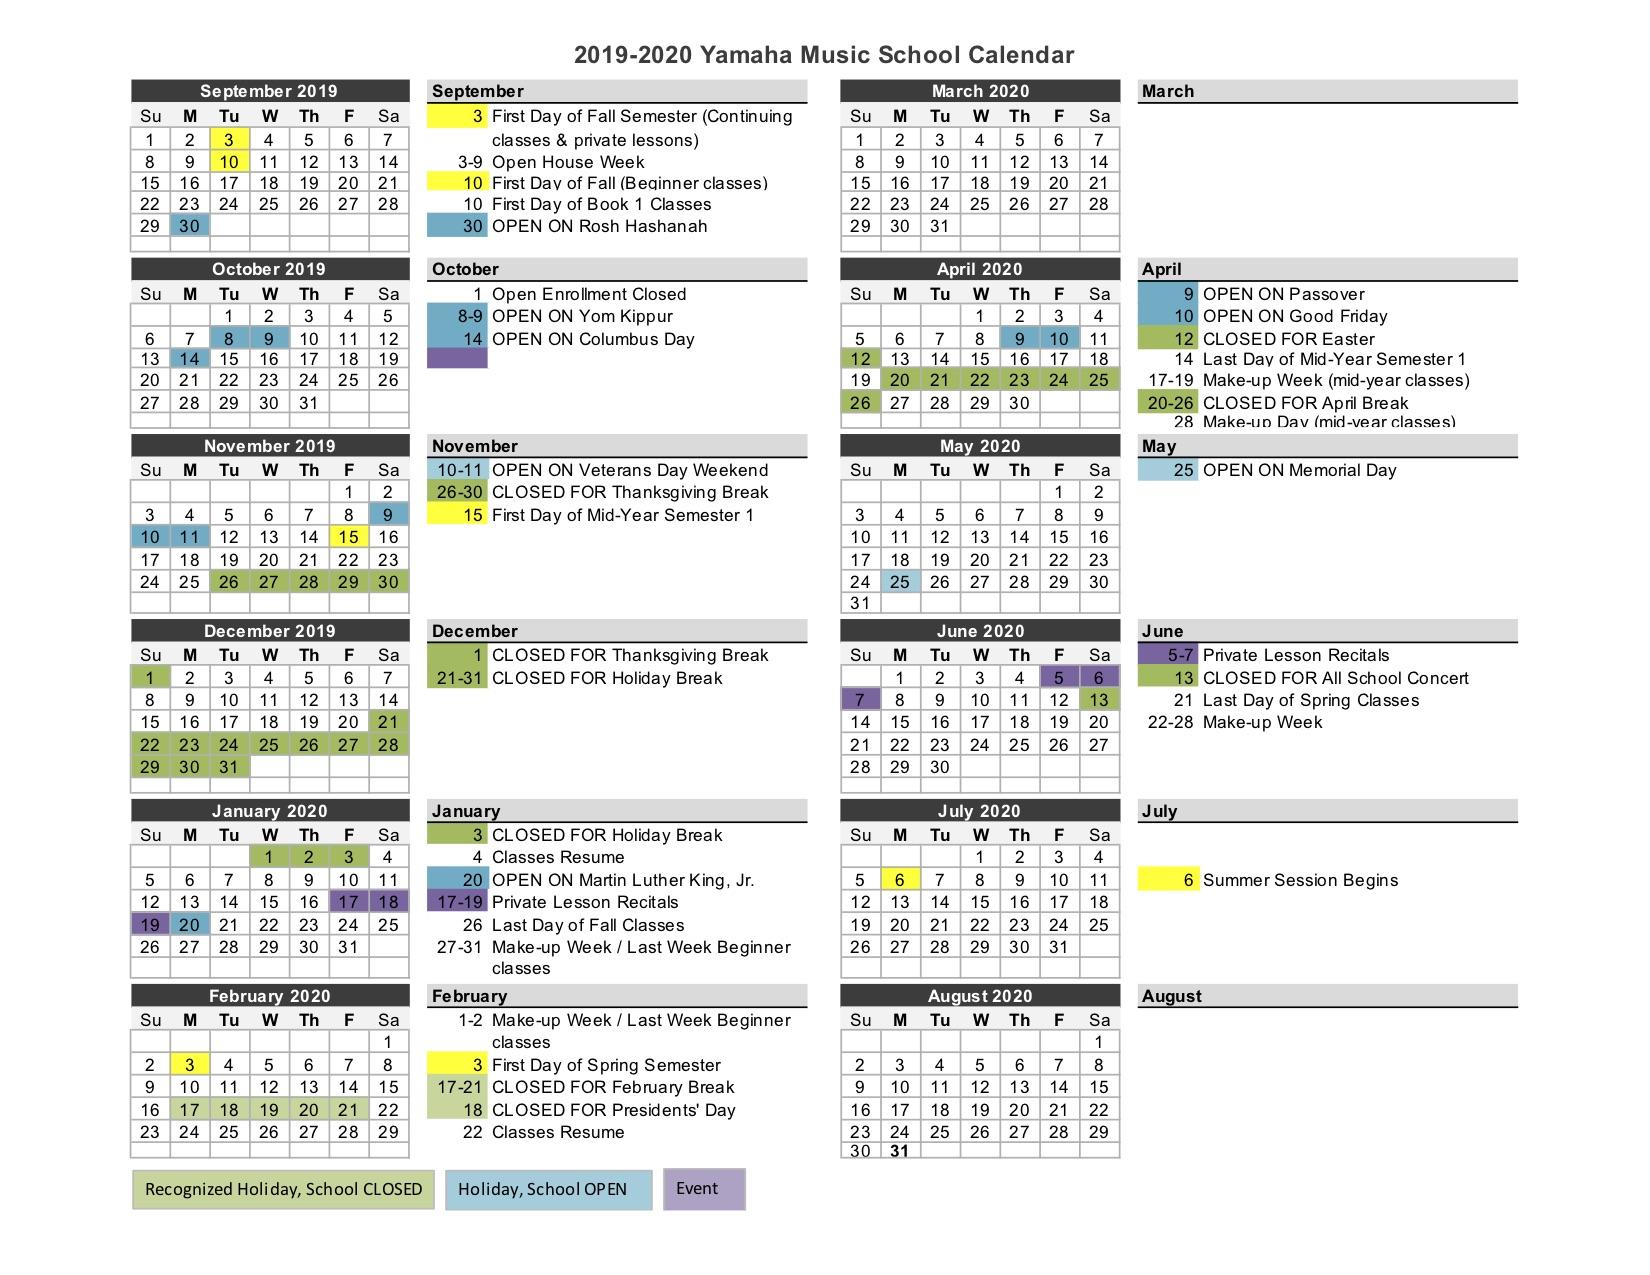 School Calendar | Yamaha Music School Throughout Johnson And Wales 2021 2020 Calendar